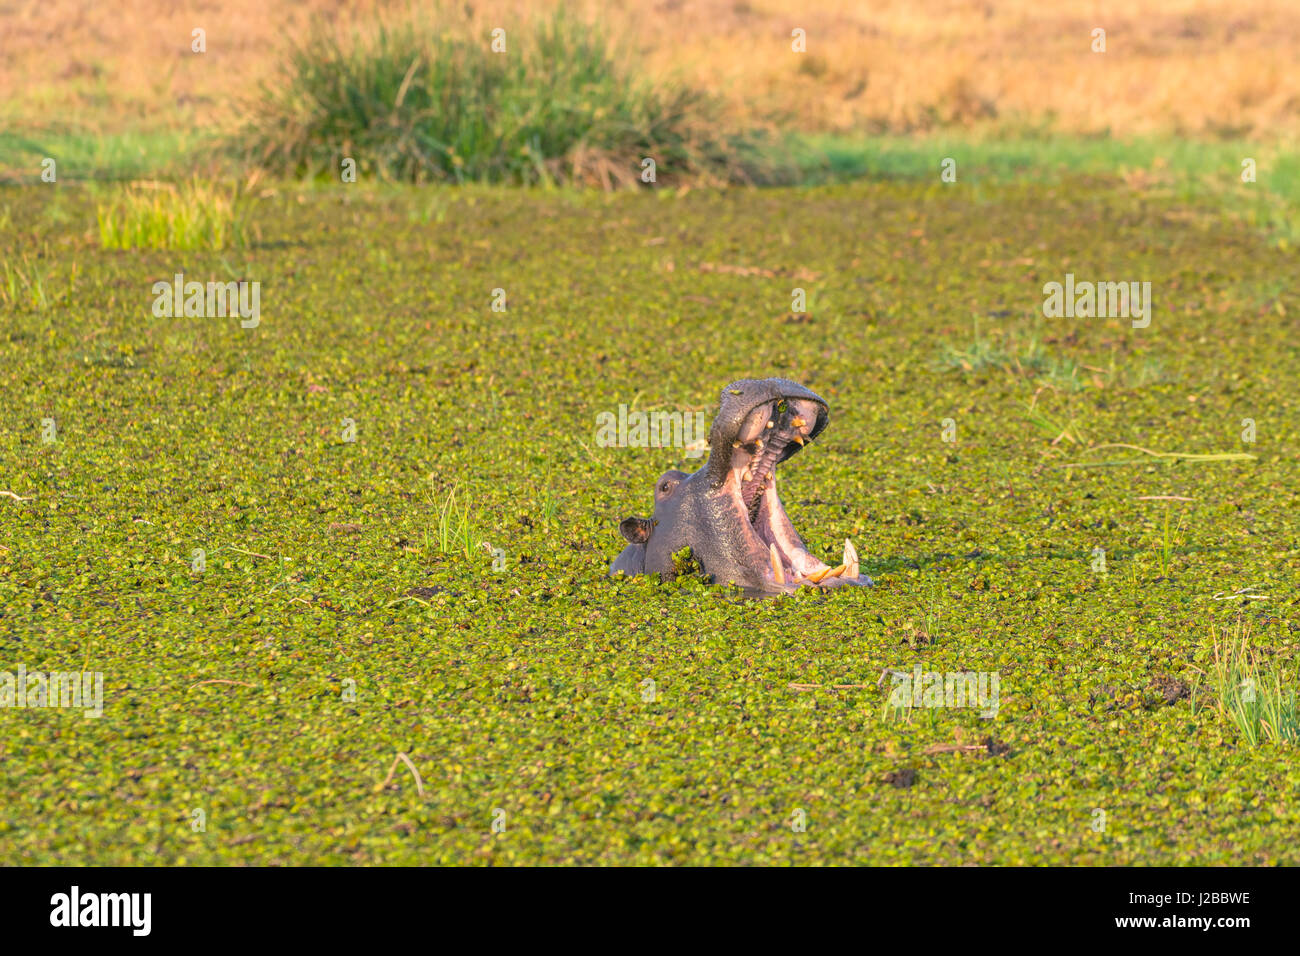 Botswana. Okavango Delta. Khwai concession. Herd of hippos (Hippopotamus amphibius) yawning in the Khwai river. - Stock Image